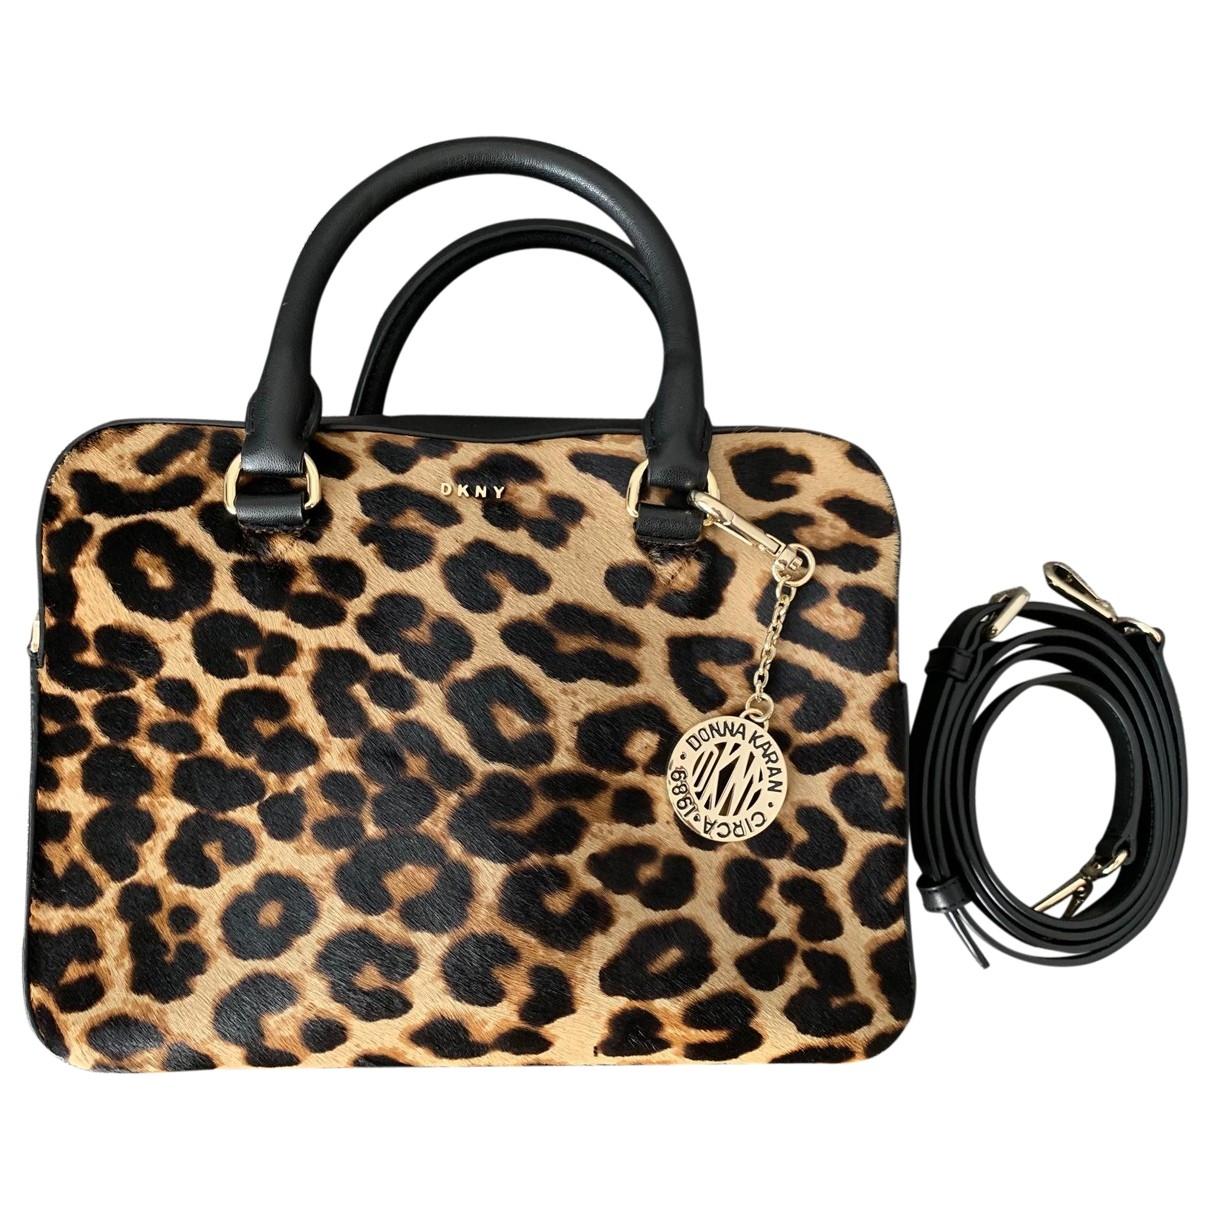 Dkny \N Multicolour Pony-style calfskin handbag for Women \N